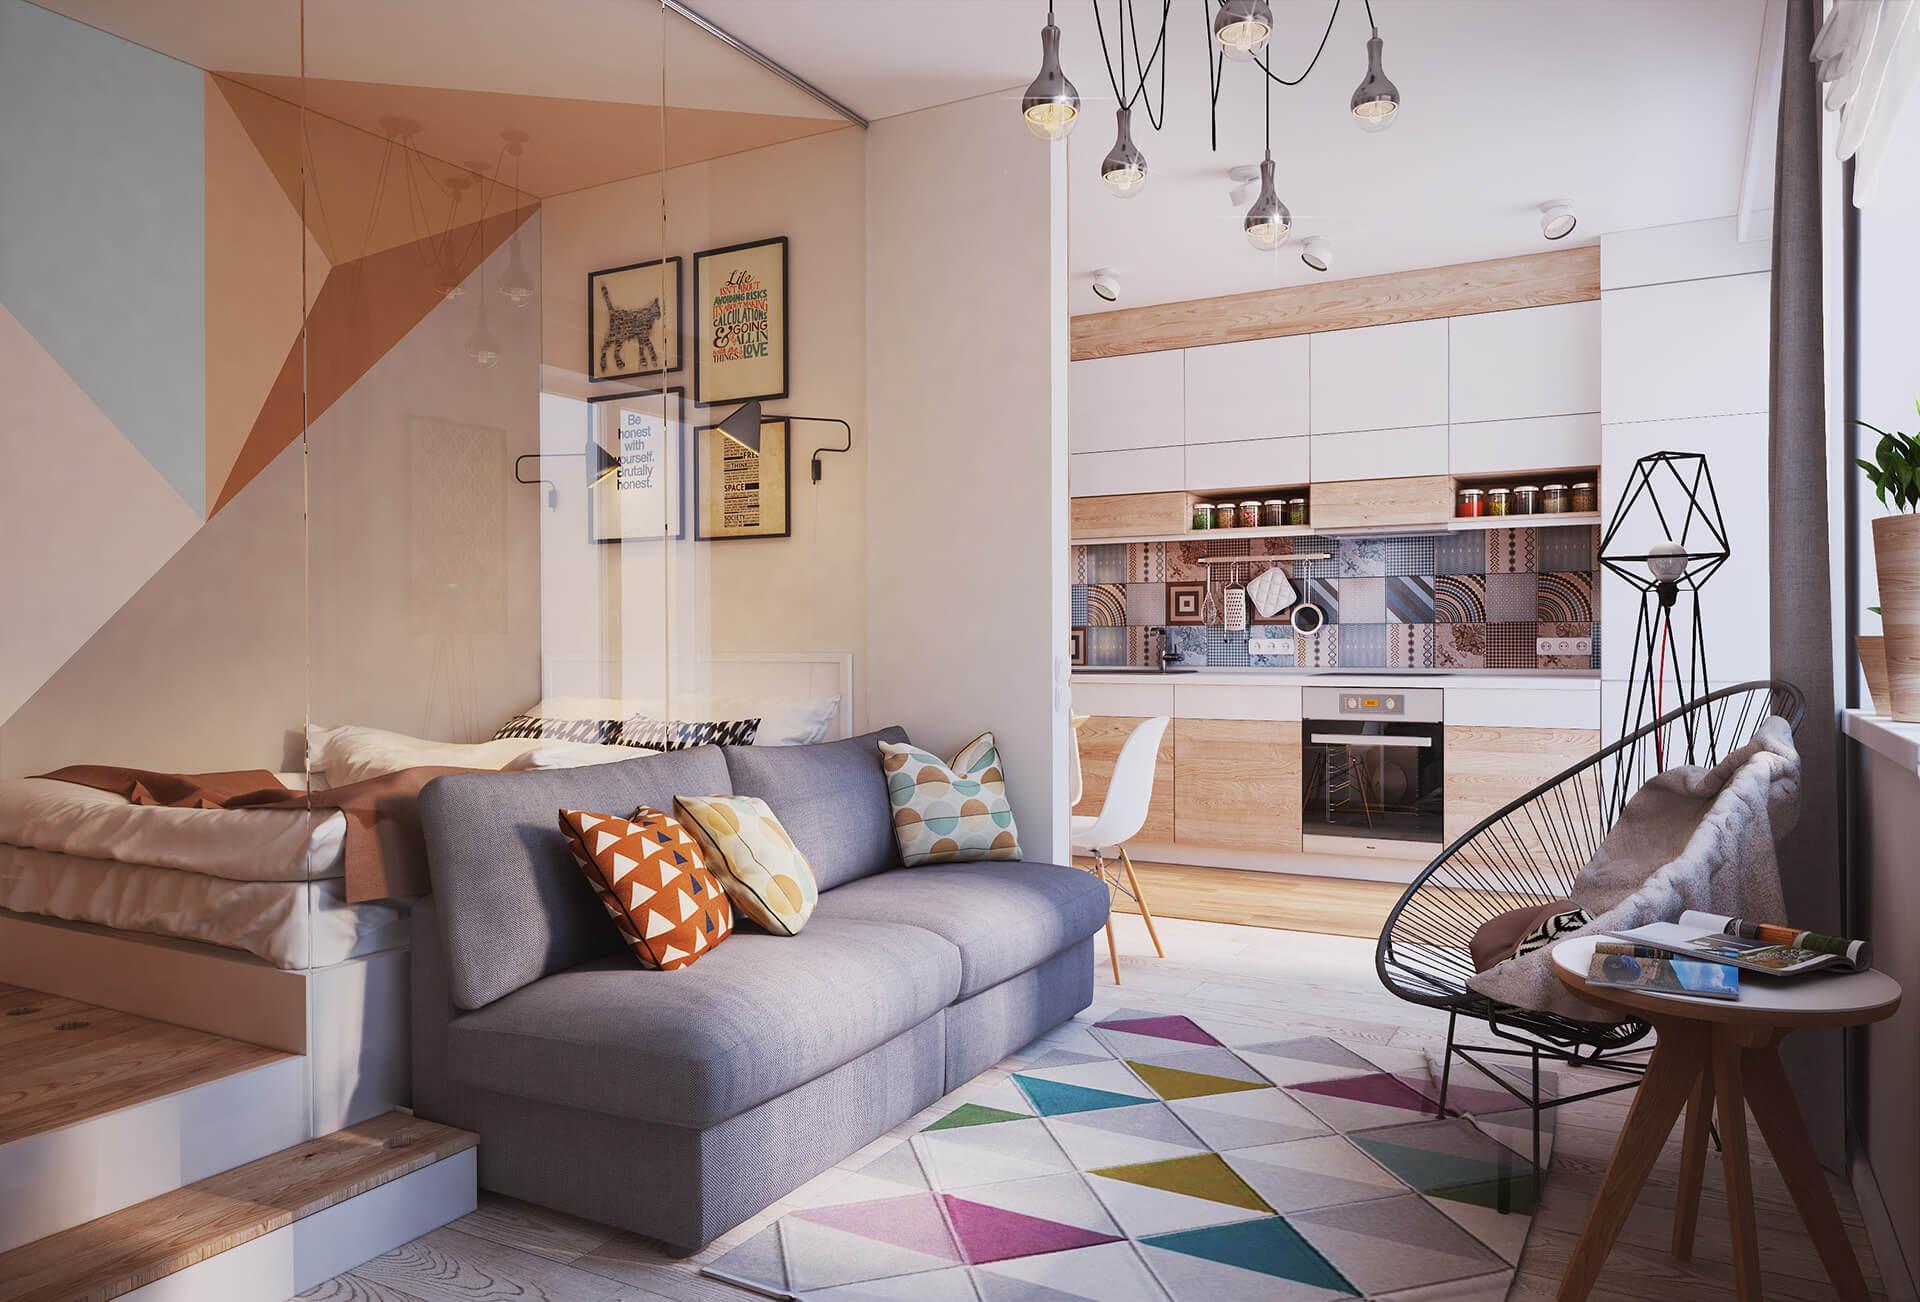 Design Ideas For Studio Apartments ideas studio design apartment Fabulous Design Ideas For Small Apartments